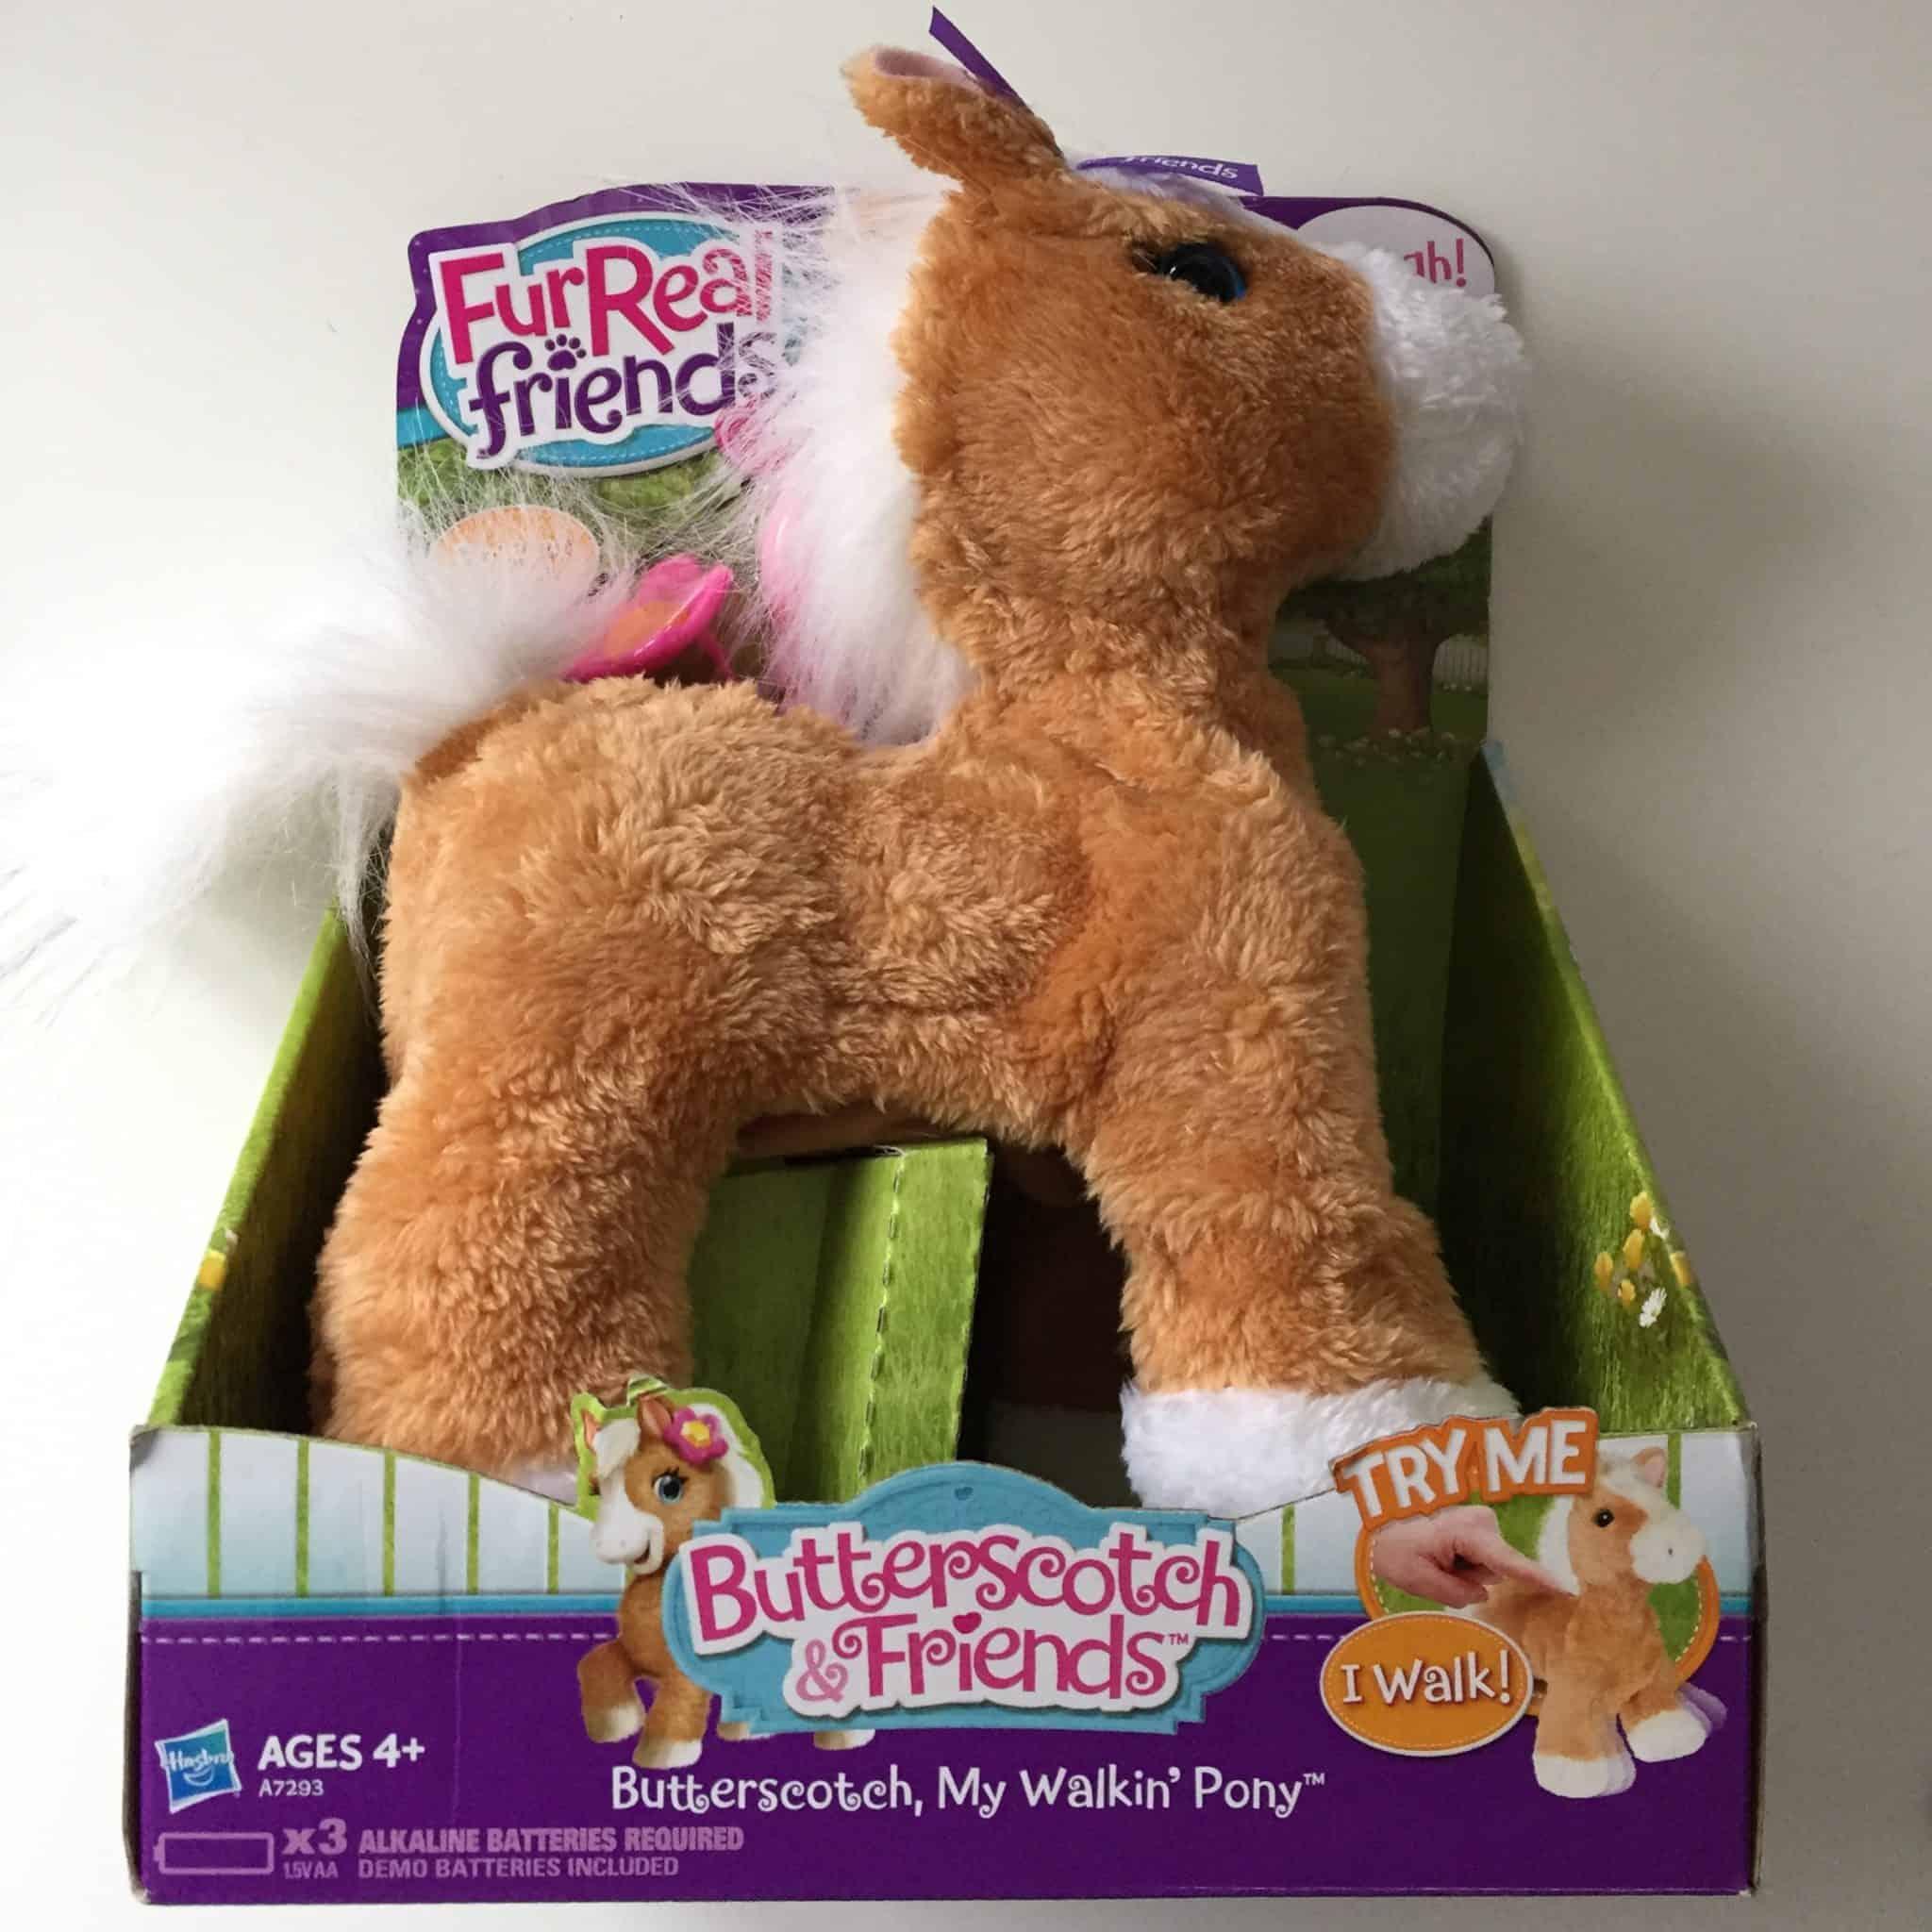 Butterscotch Walkin' Pony